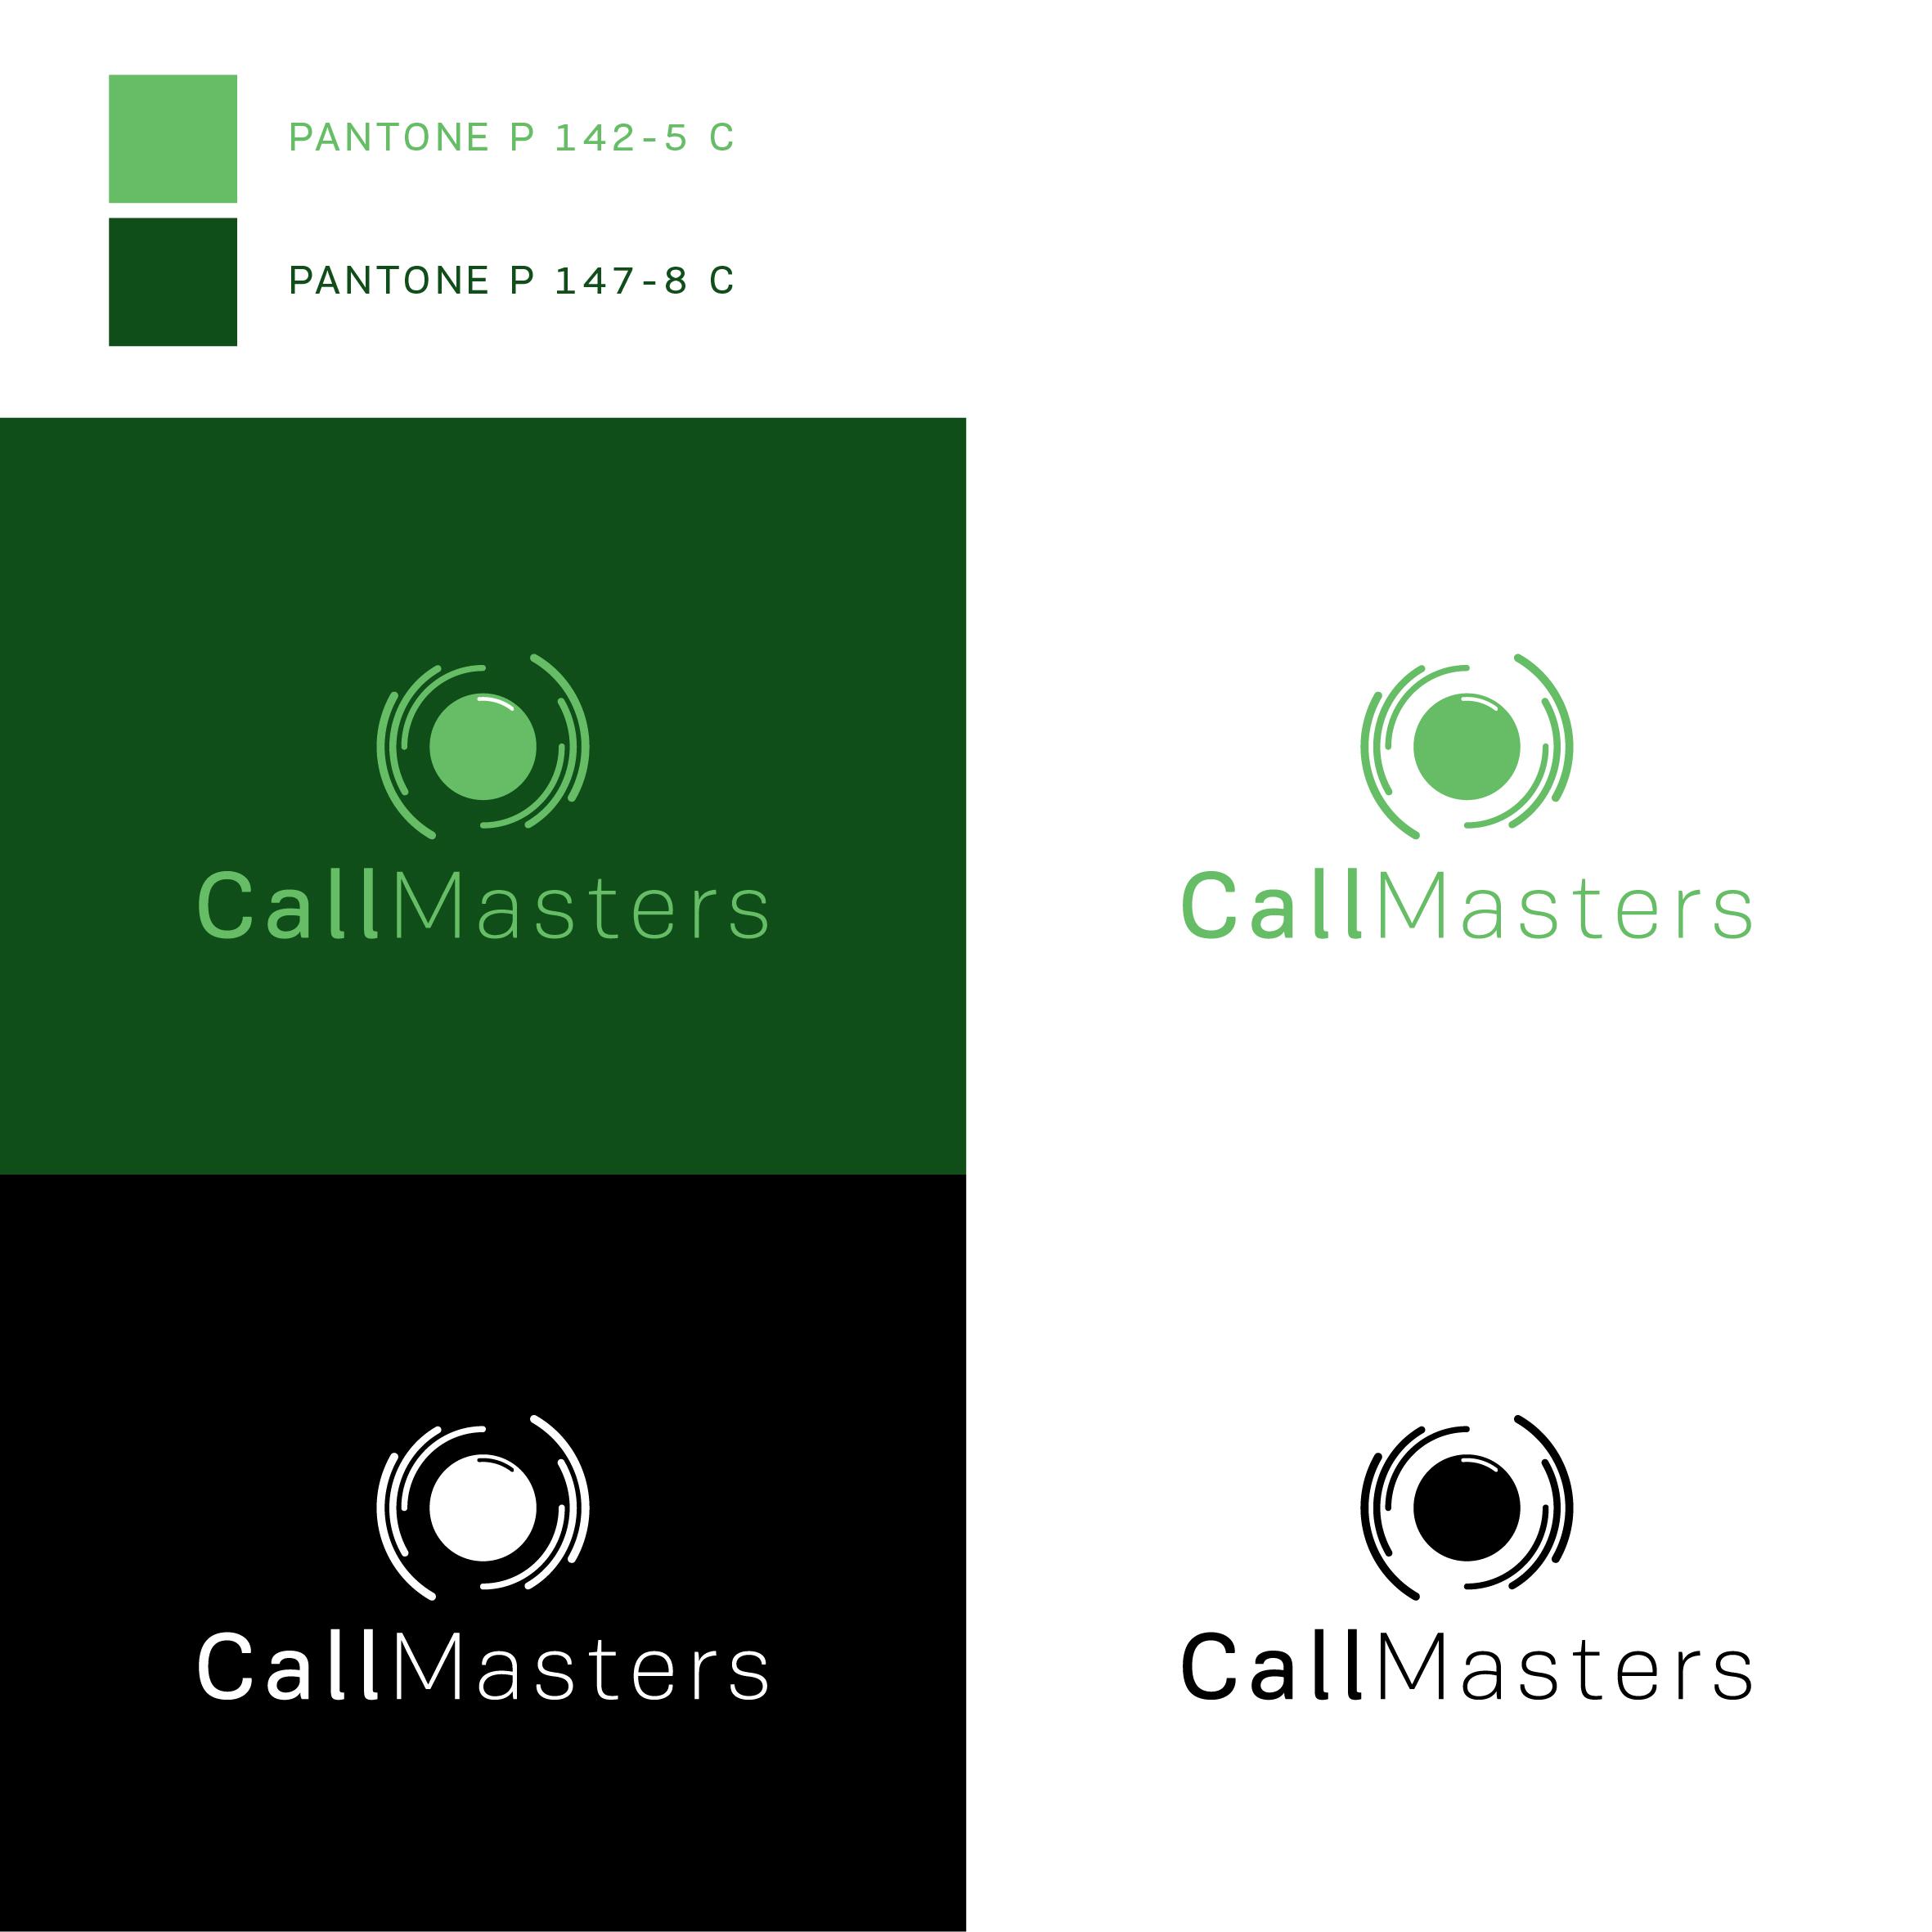 Логотип call-центра Callmasters  фото f_4465b6ad3e34fa82.jpg